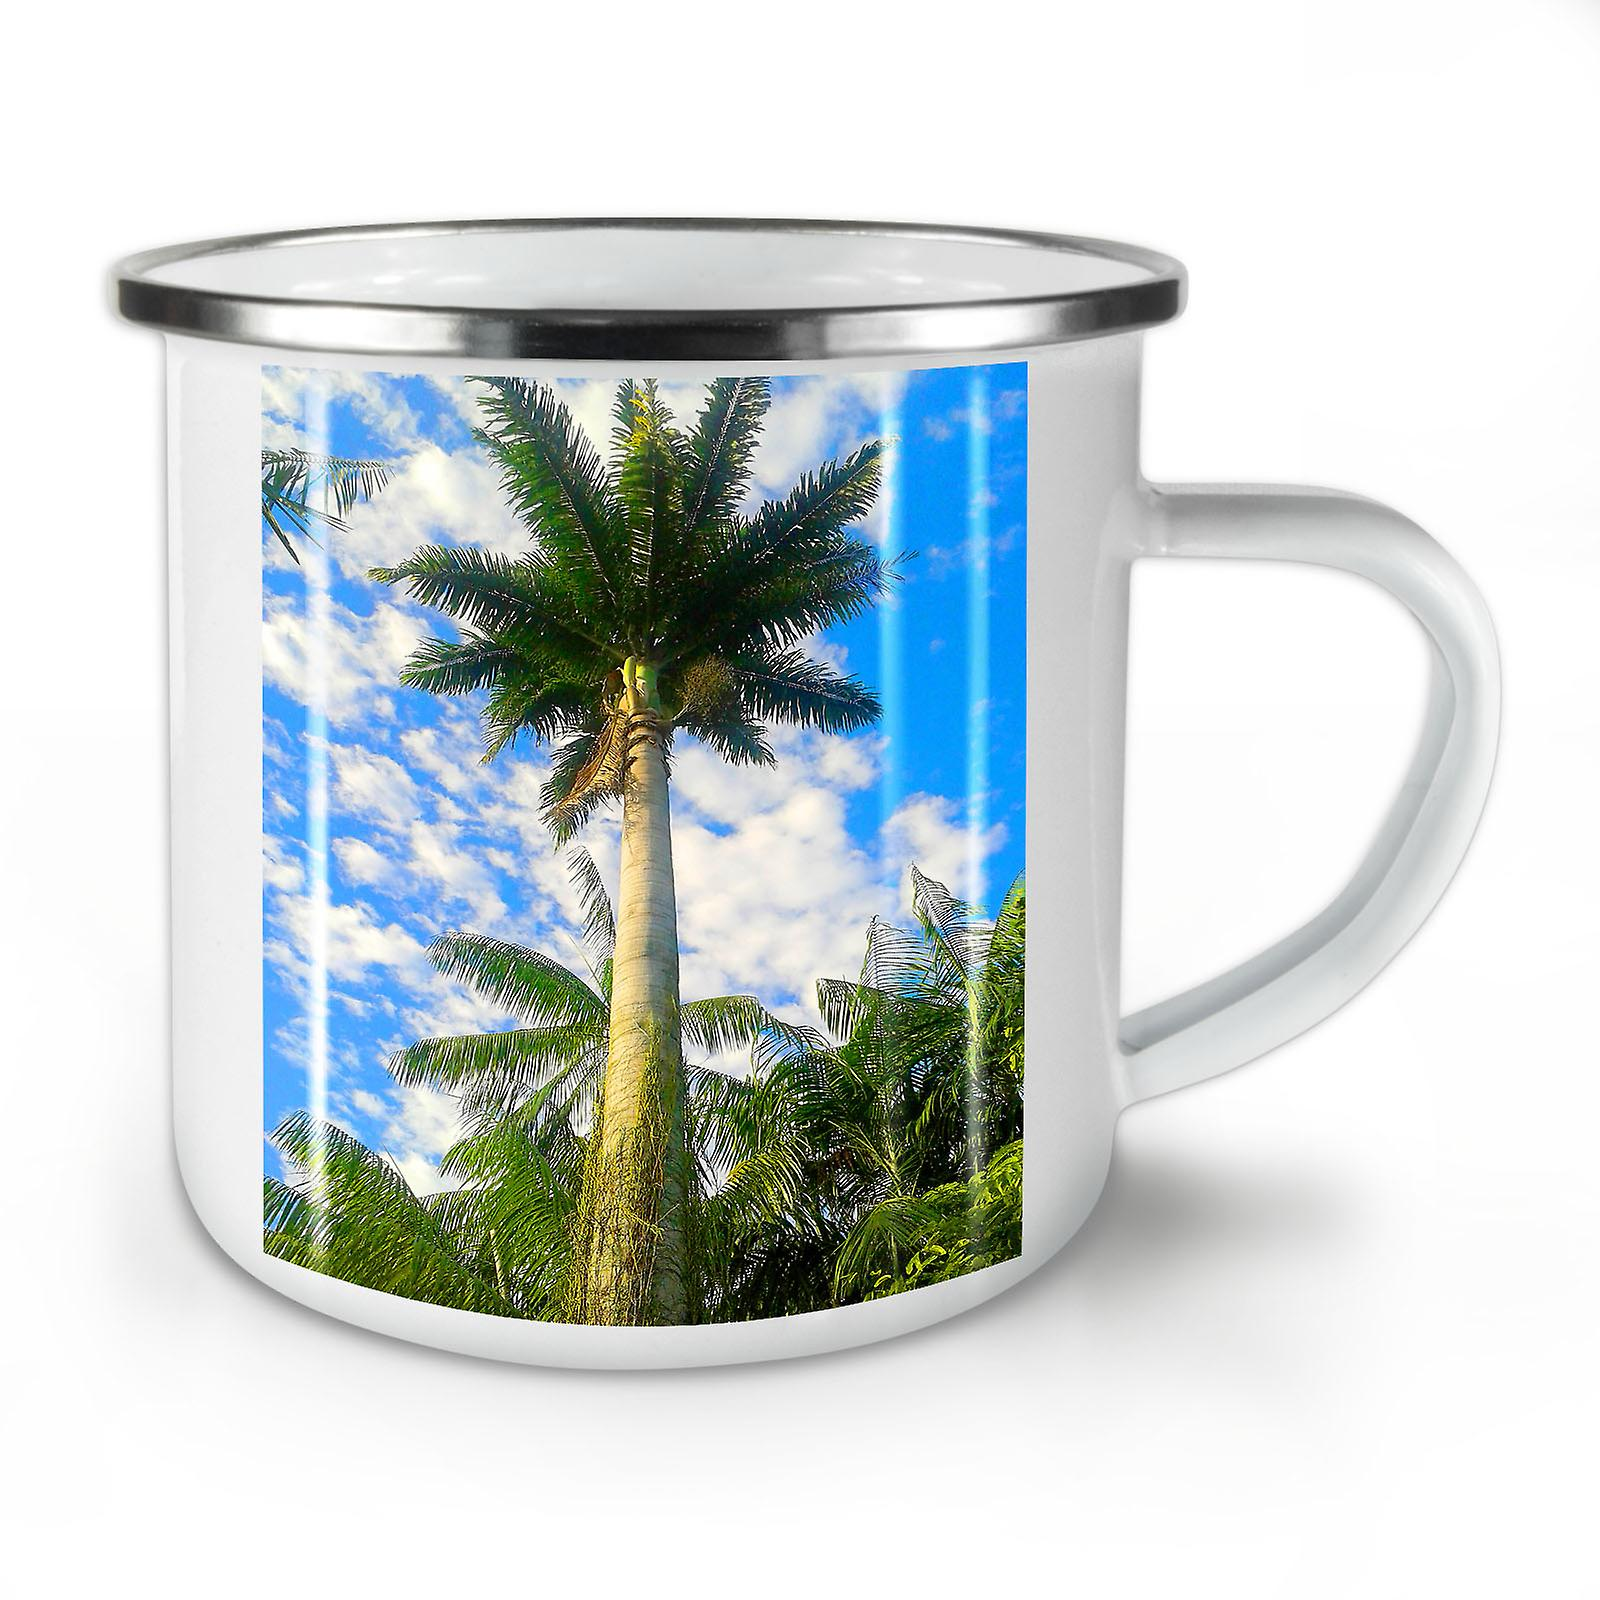 Whitetea Bleu Café Palmier Mug10 Ciel Nouvelle Mer Émail OzWellcoda pUMSzLVGq